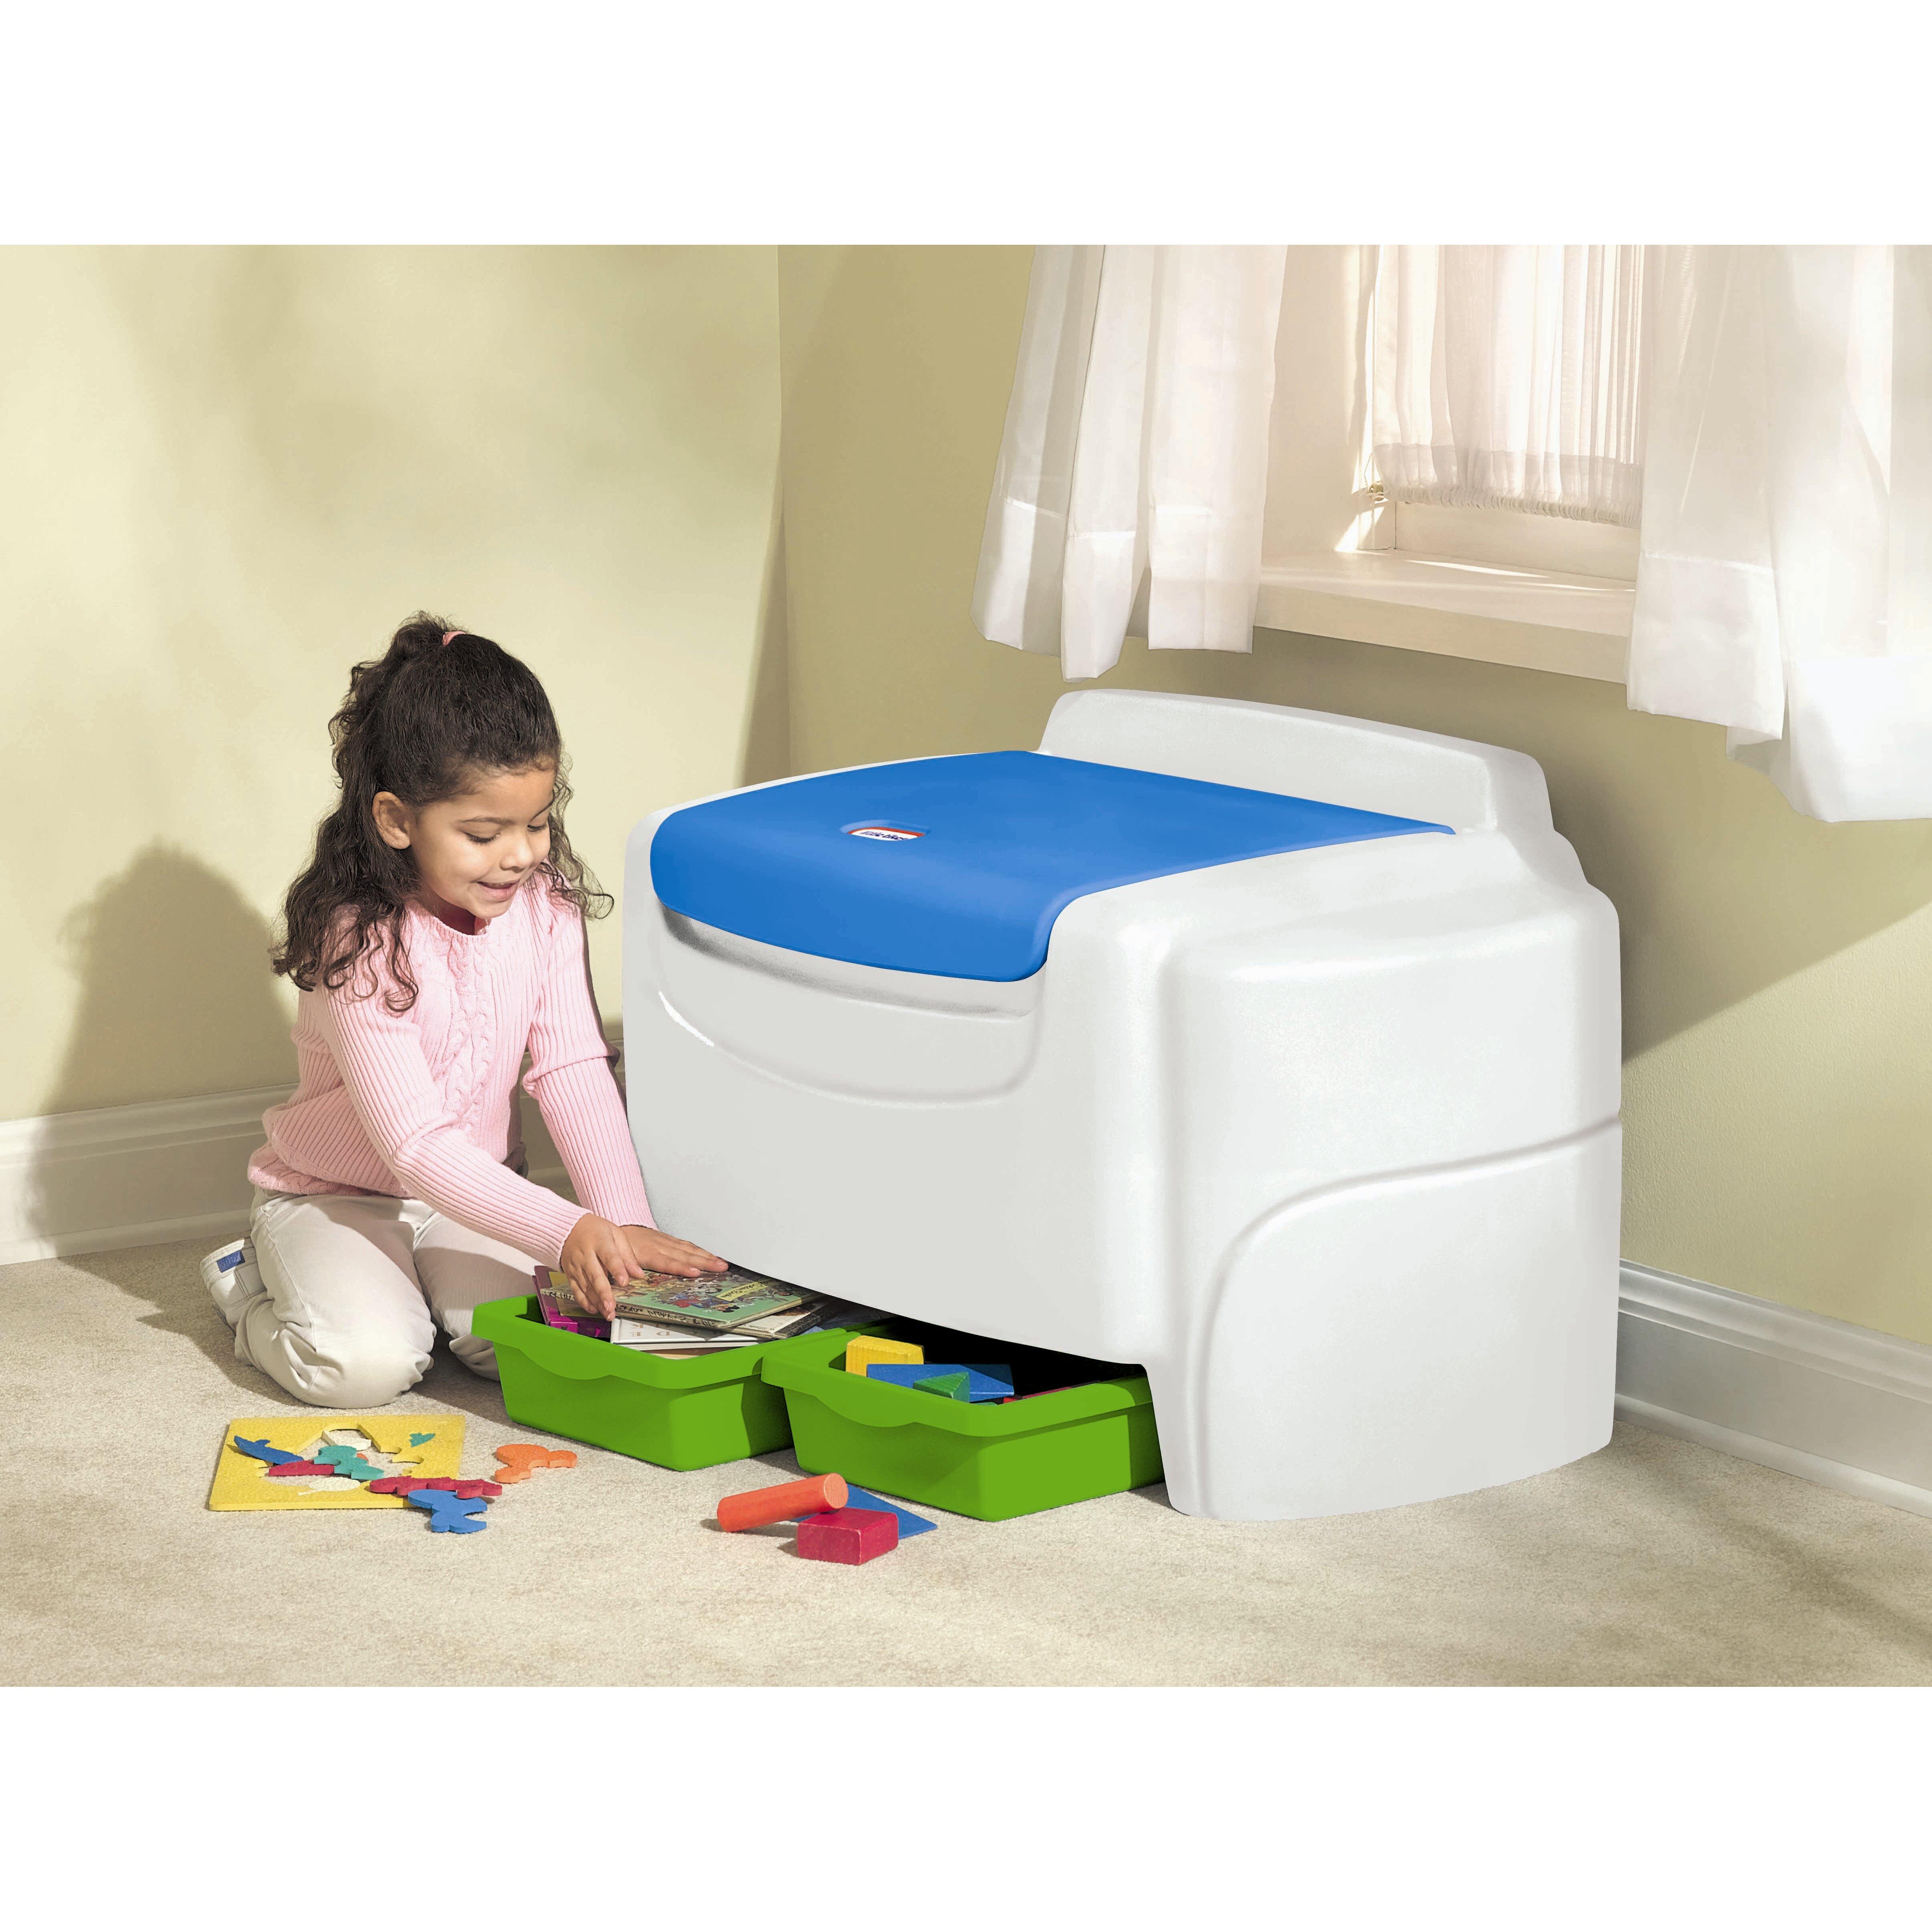 Little Tikes Sort N Store Toy Box Amp Reviews Wayfair